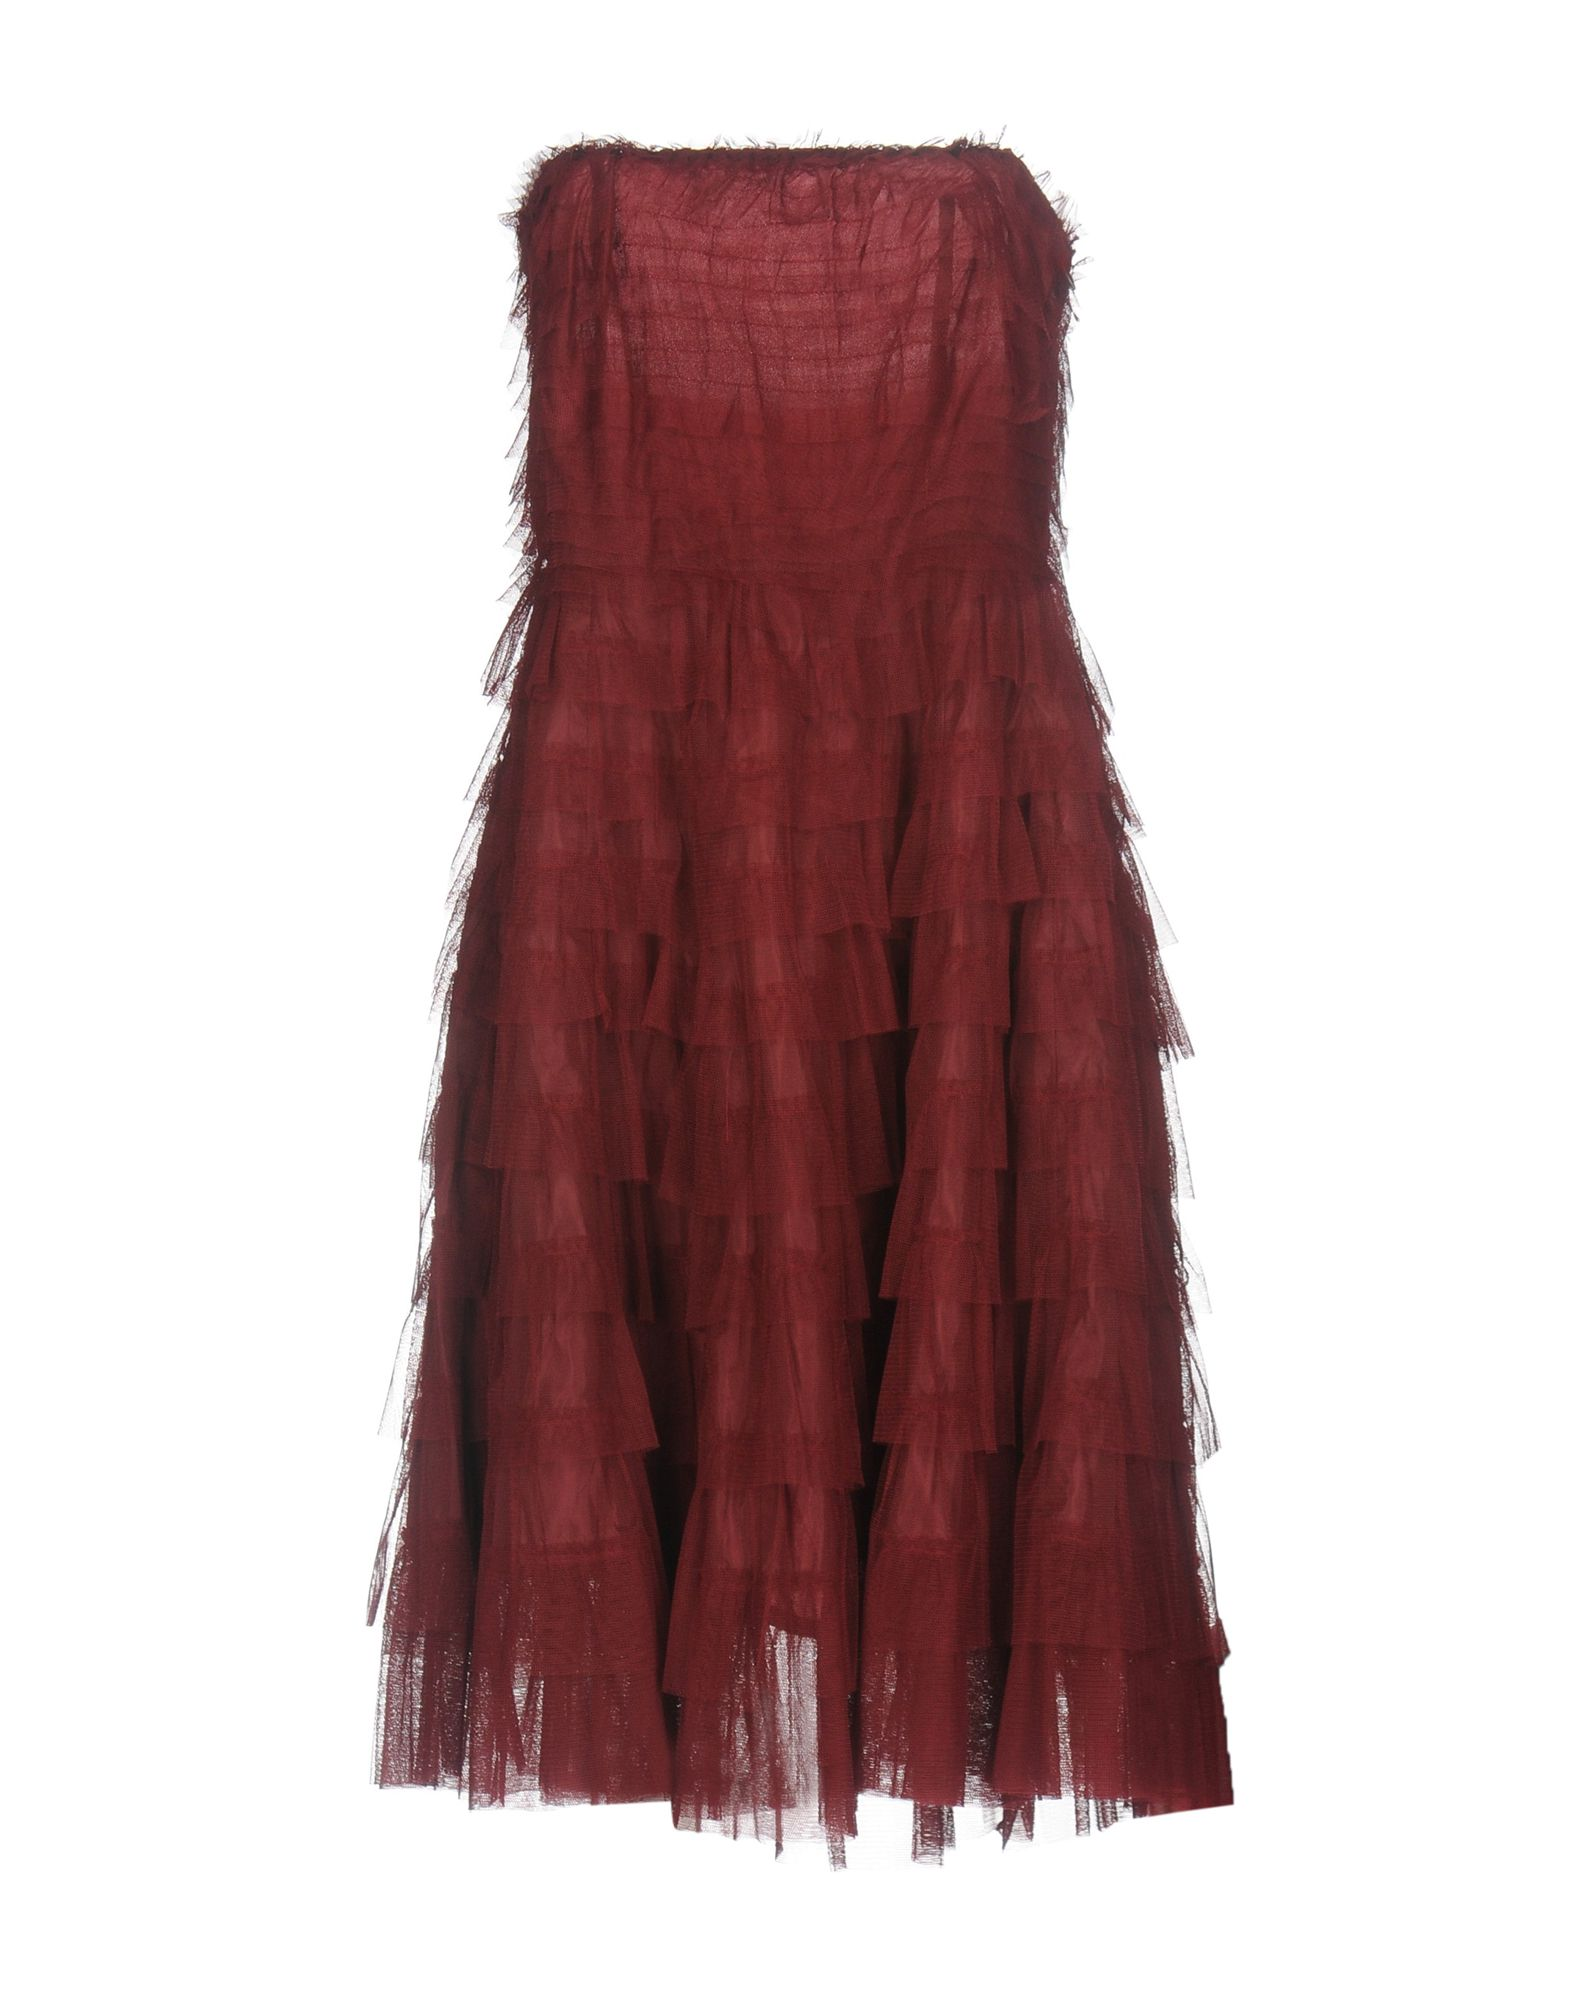 RISE Short Dresses in Maroon